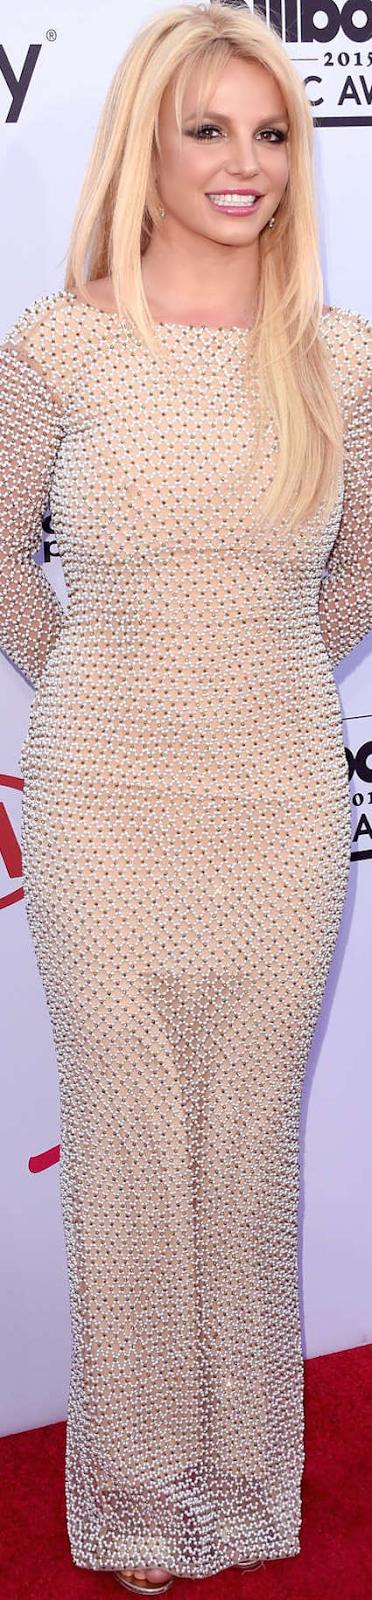 2015 Billboard Awards Britney Spears Red Carpet